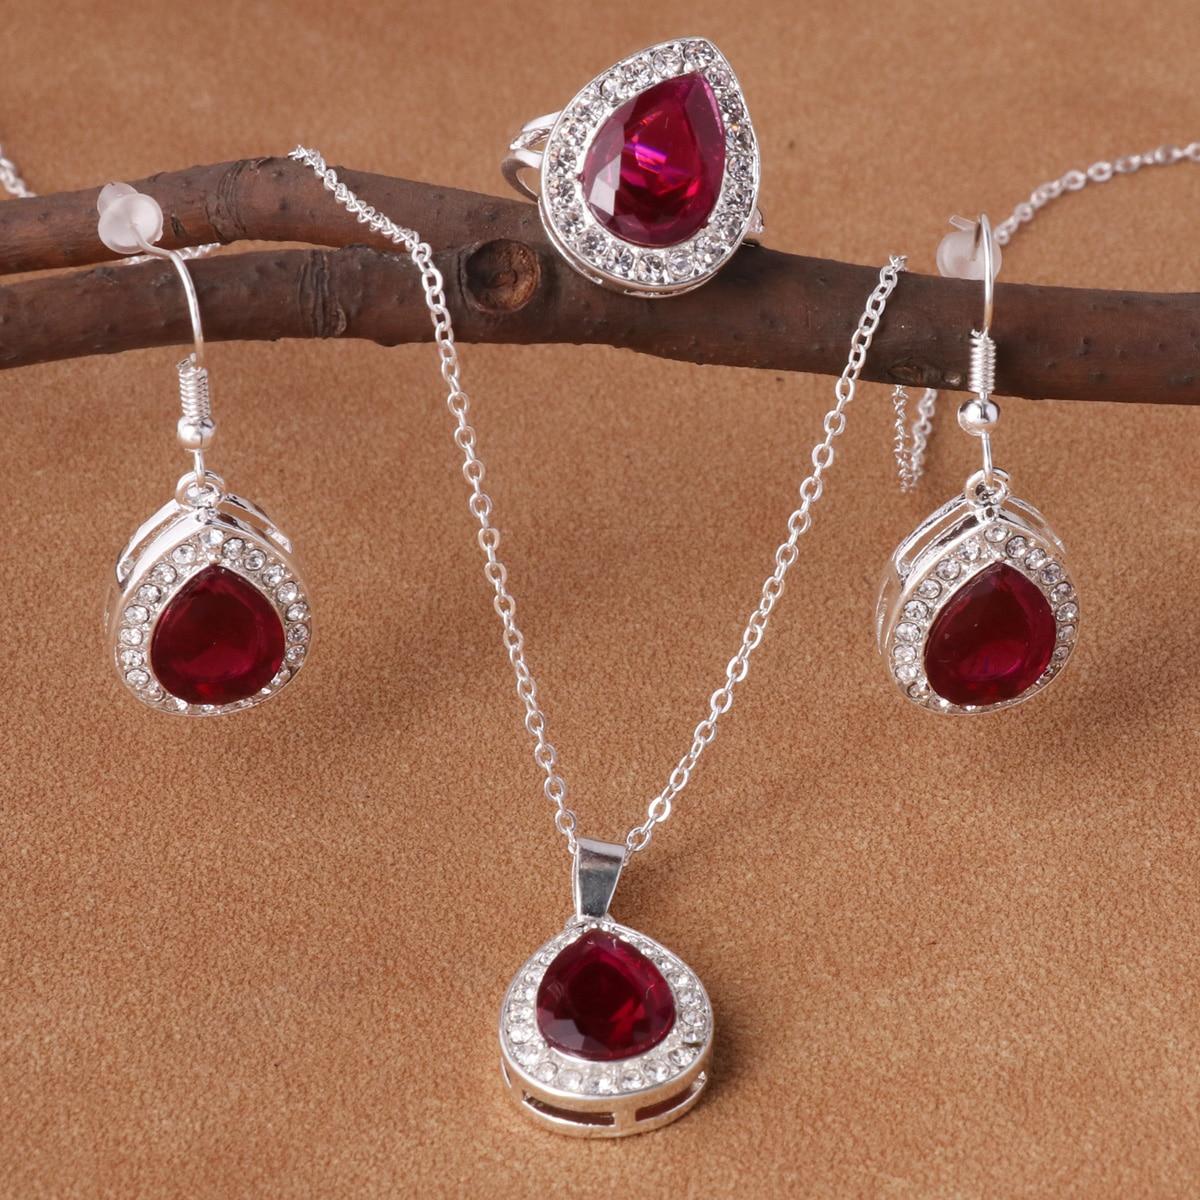 Rhinestone & Water-drop Decor Earrings & Ring & Necklace